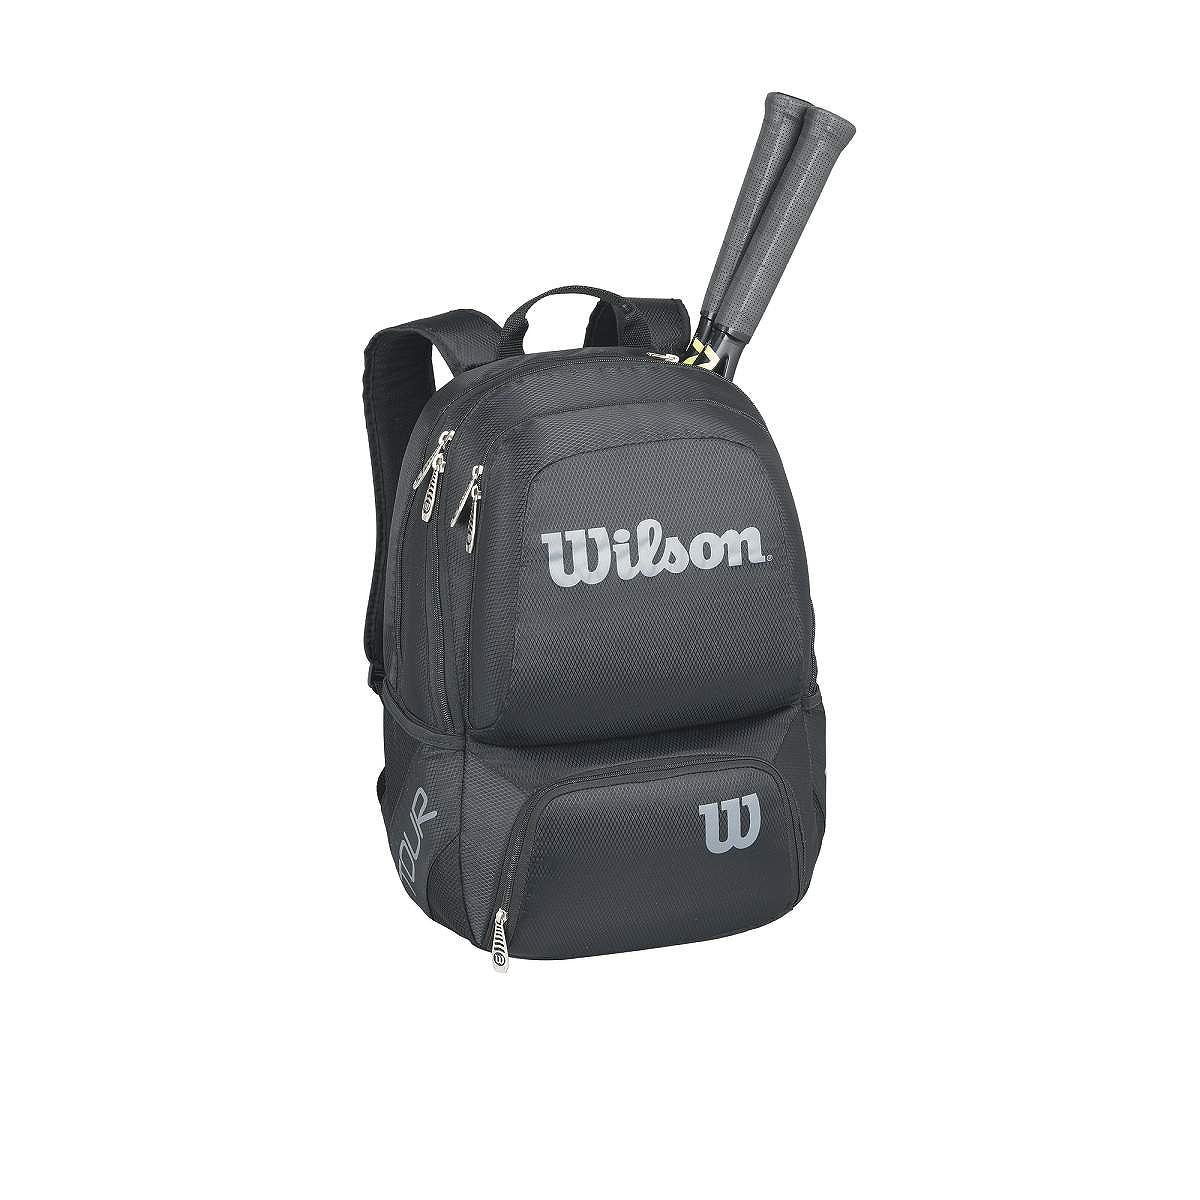 Wilson Tour Black Medium Backpack